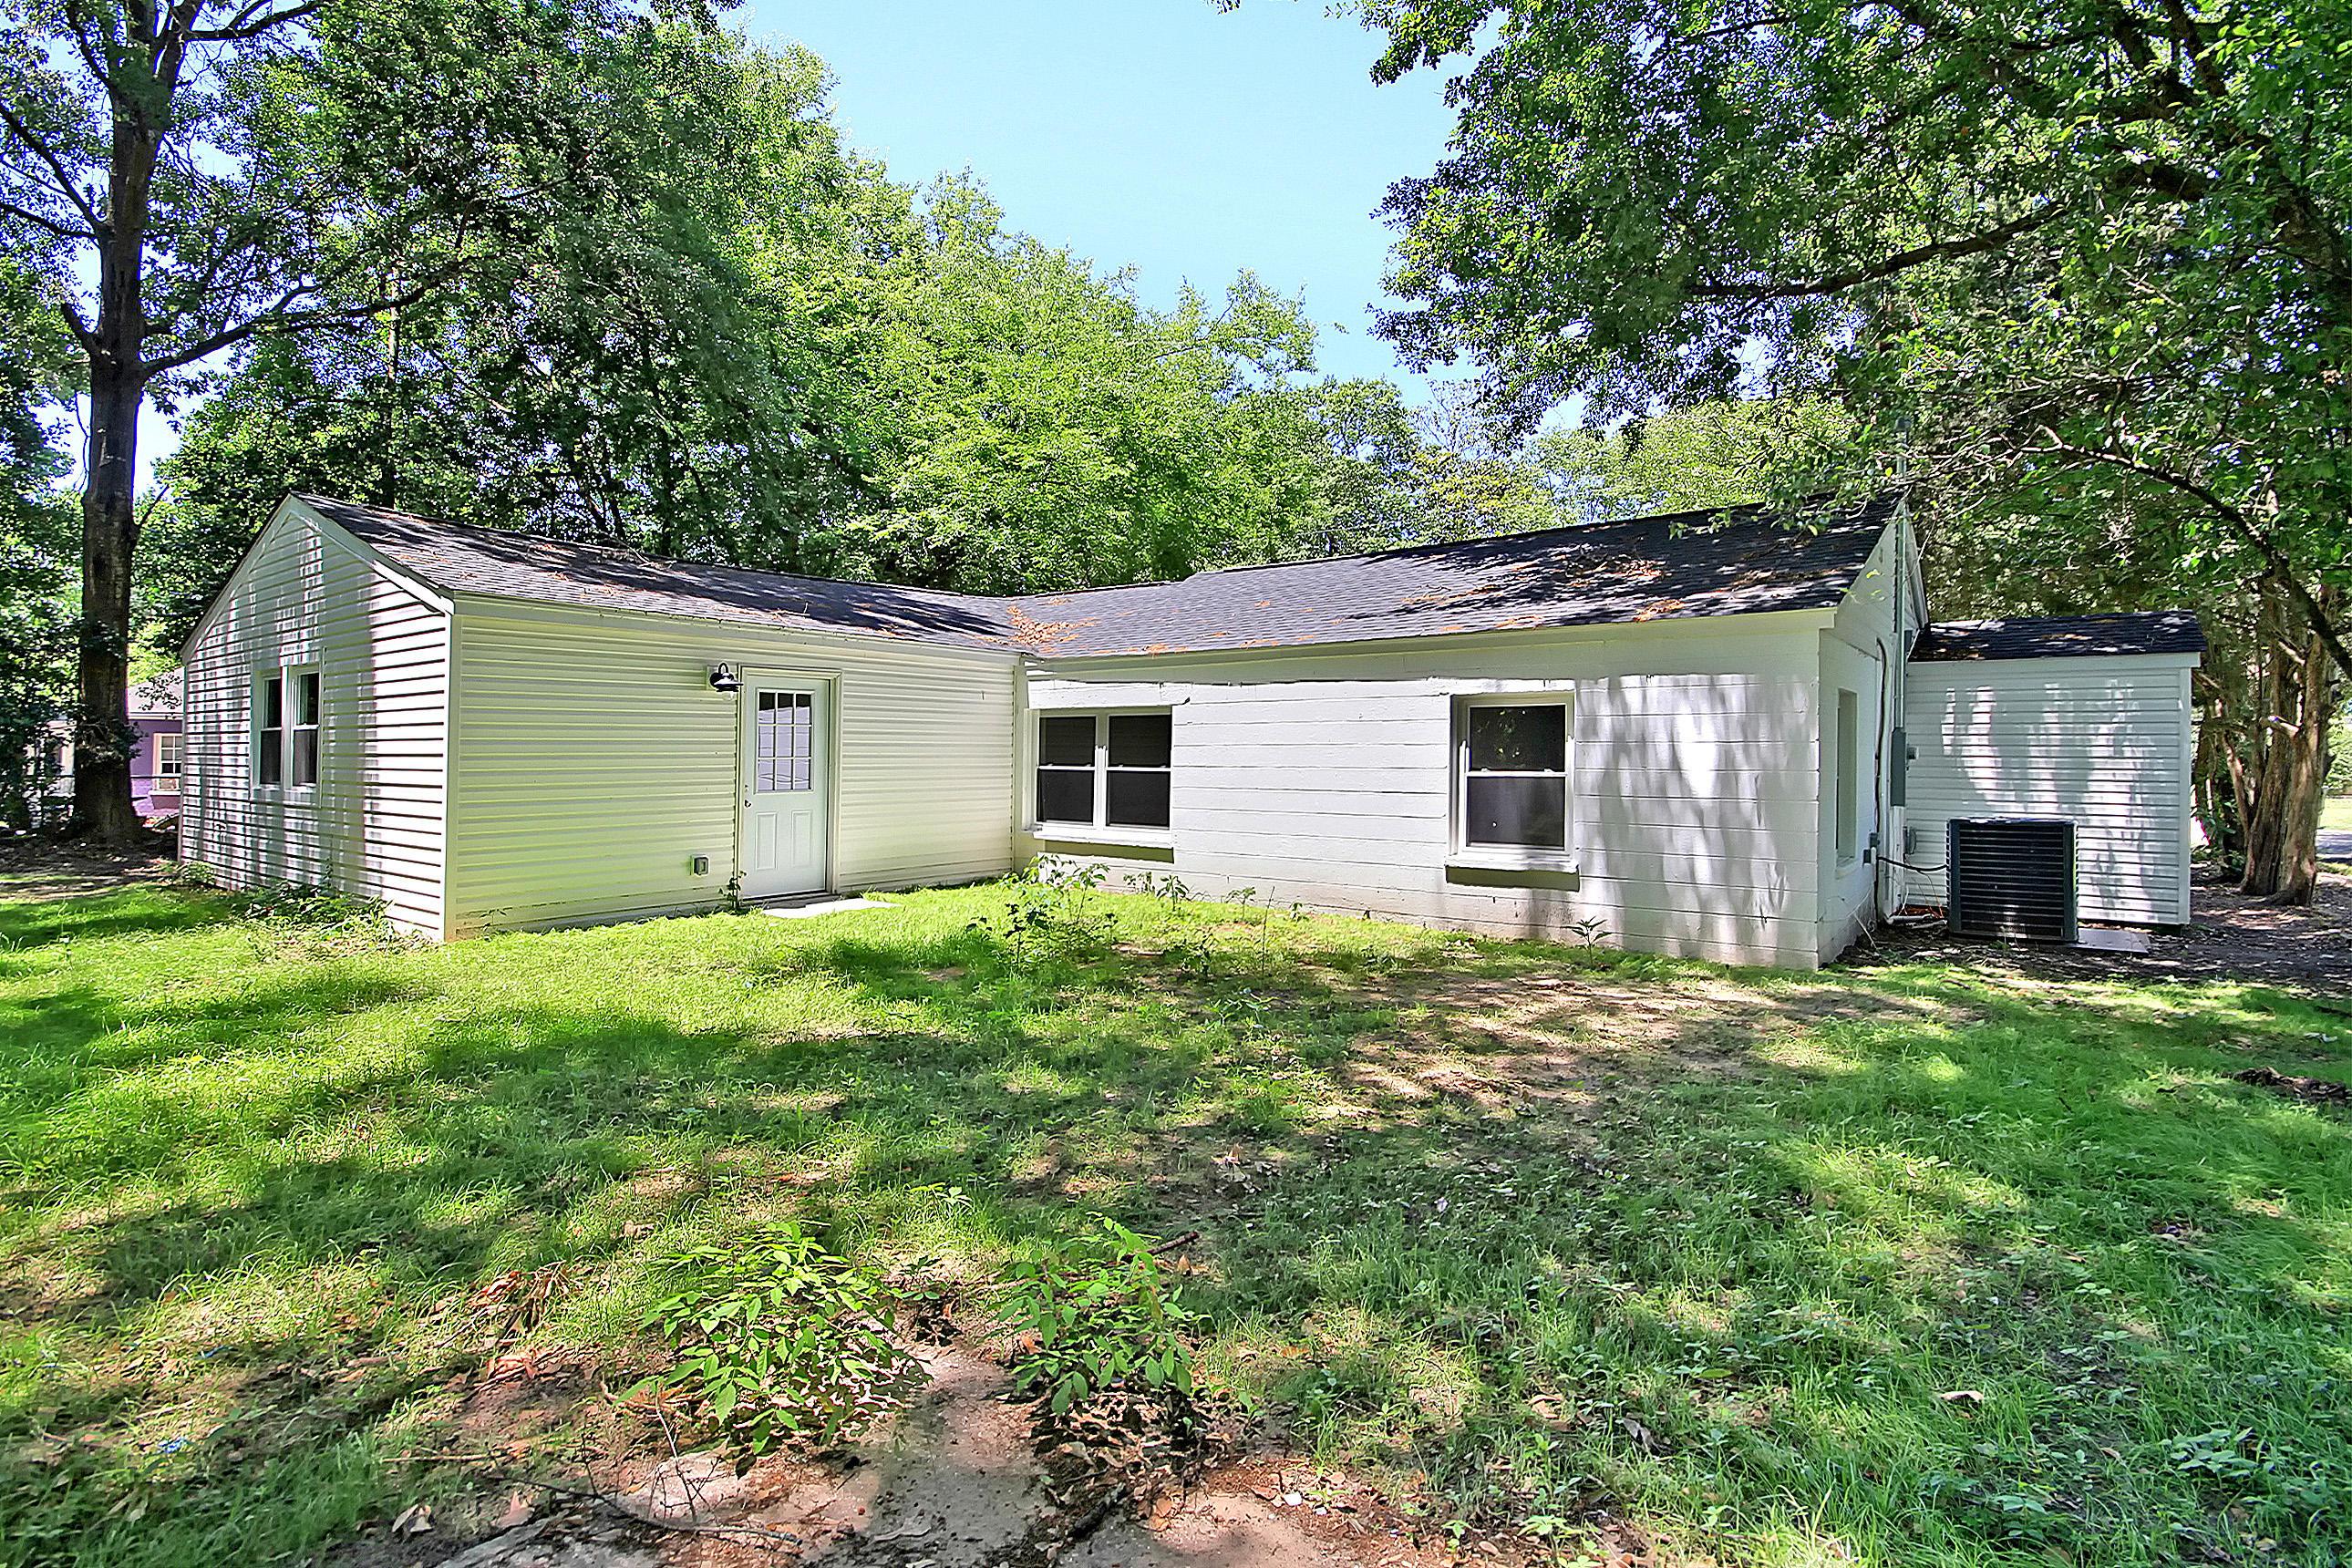 Yeamans Park Homes For Sale - 1207 Jones, Hanahan, SC - 25